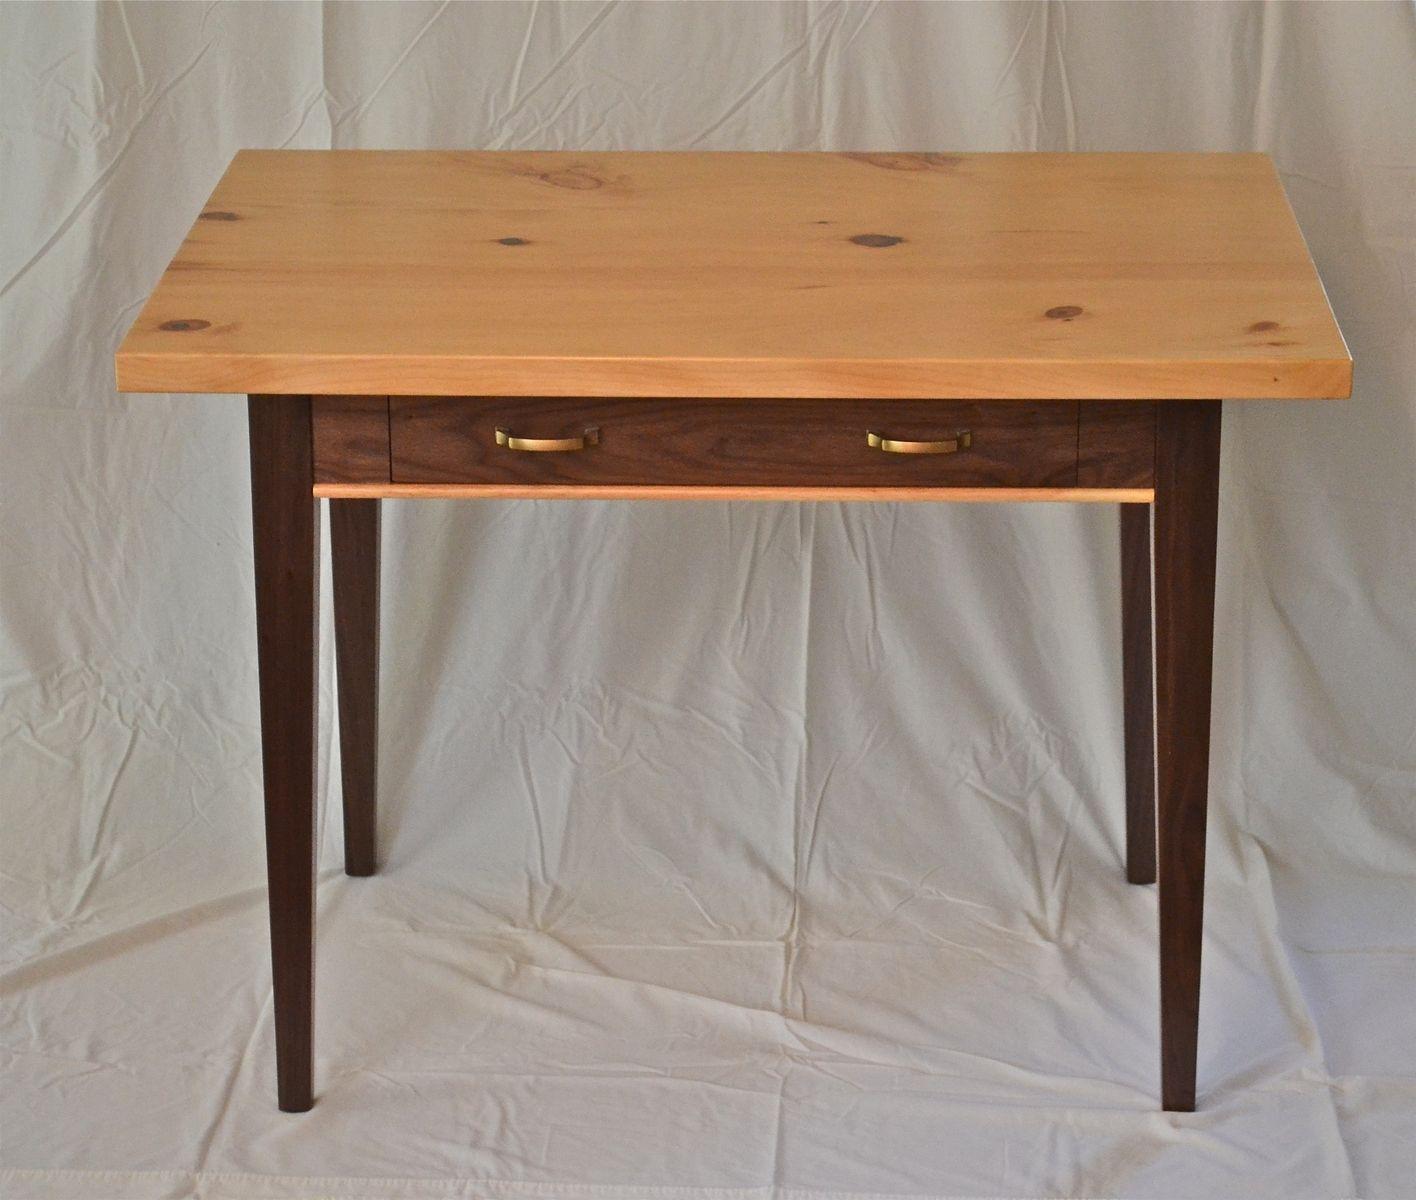 Custom Made Writing Desk Of Black Walnut And Knotty Pine